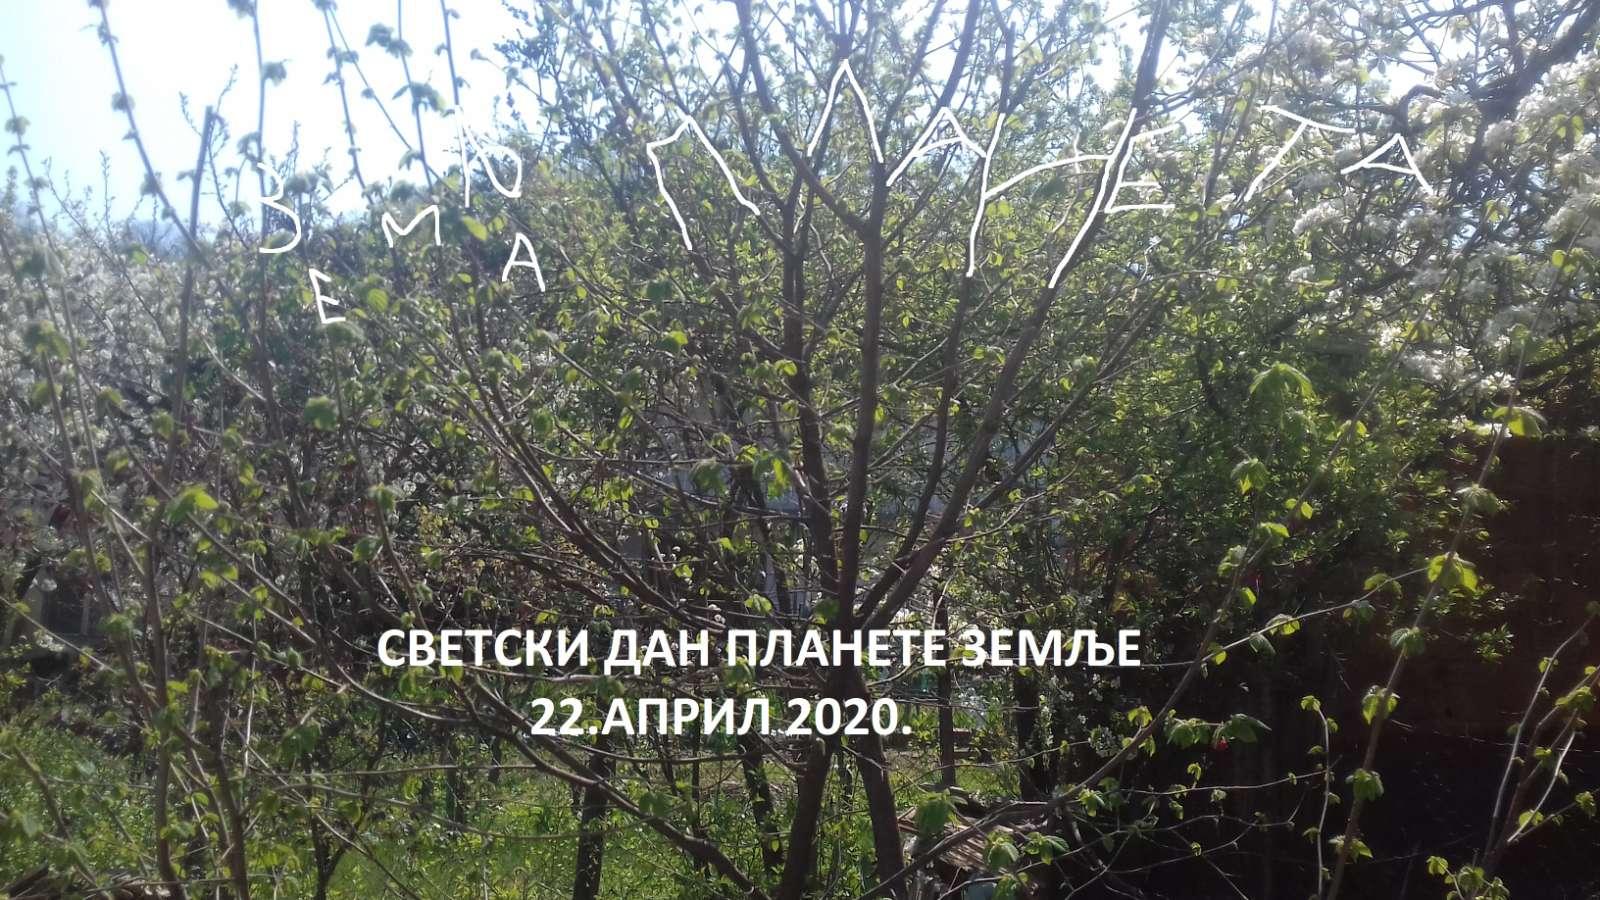 viber_image_2020-04-24_12-15-31